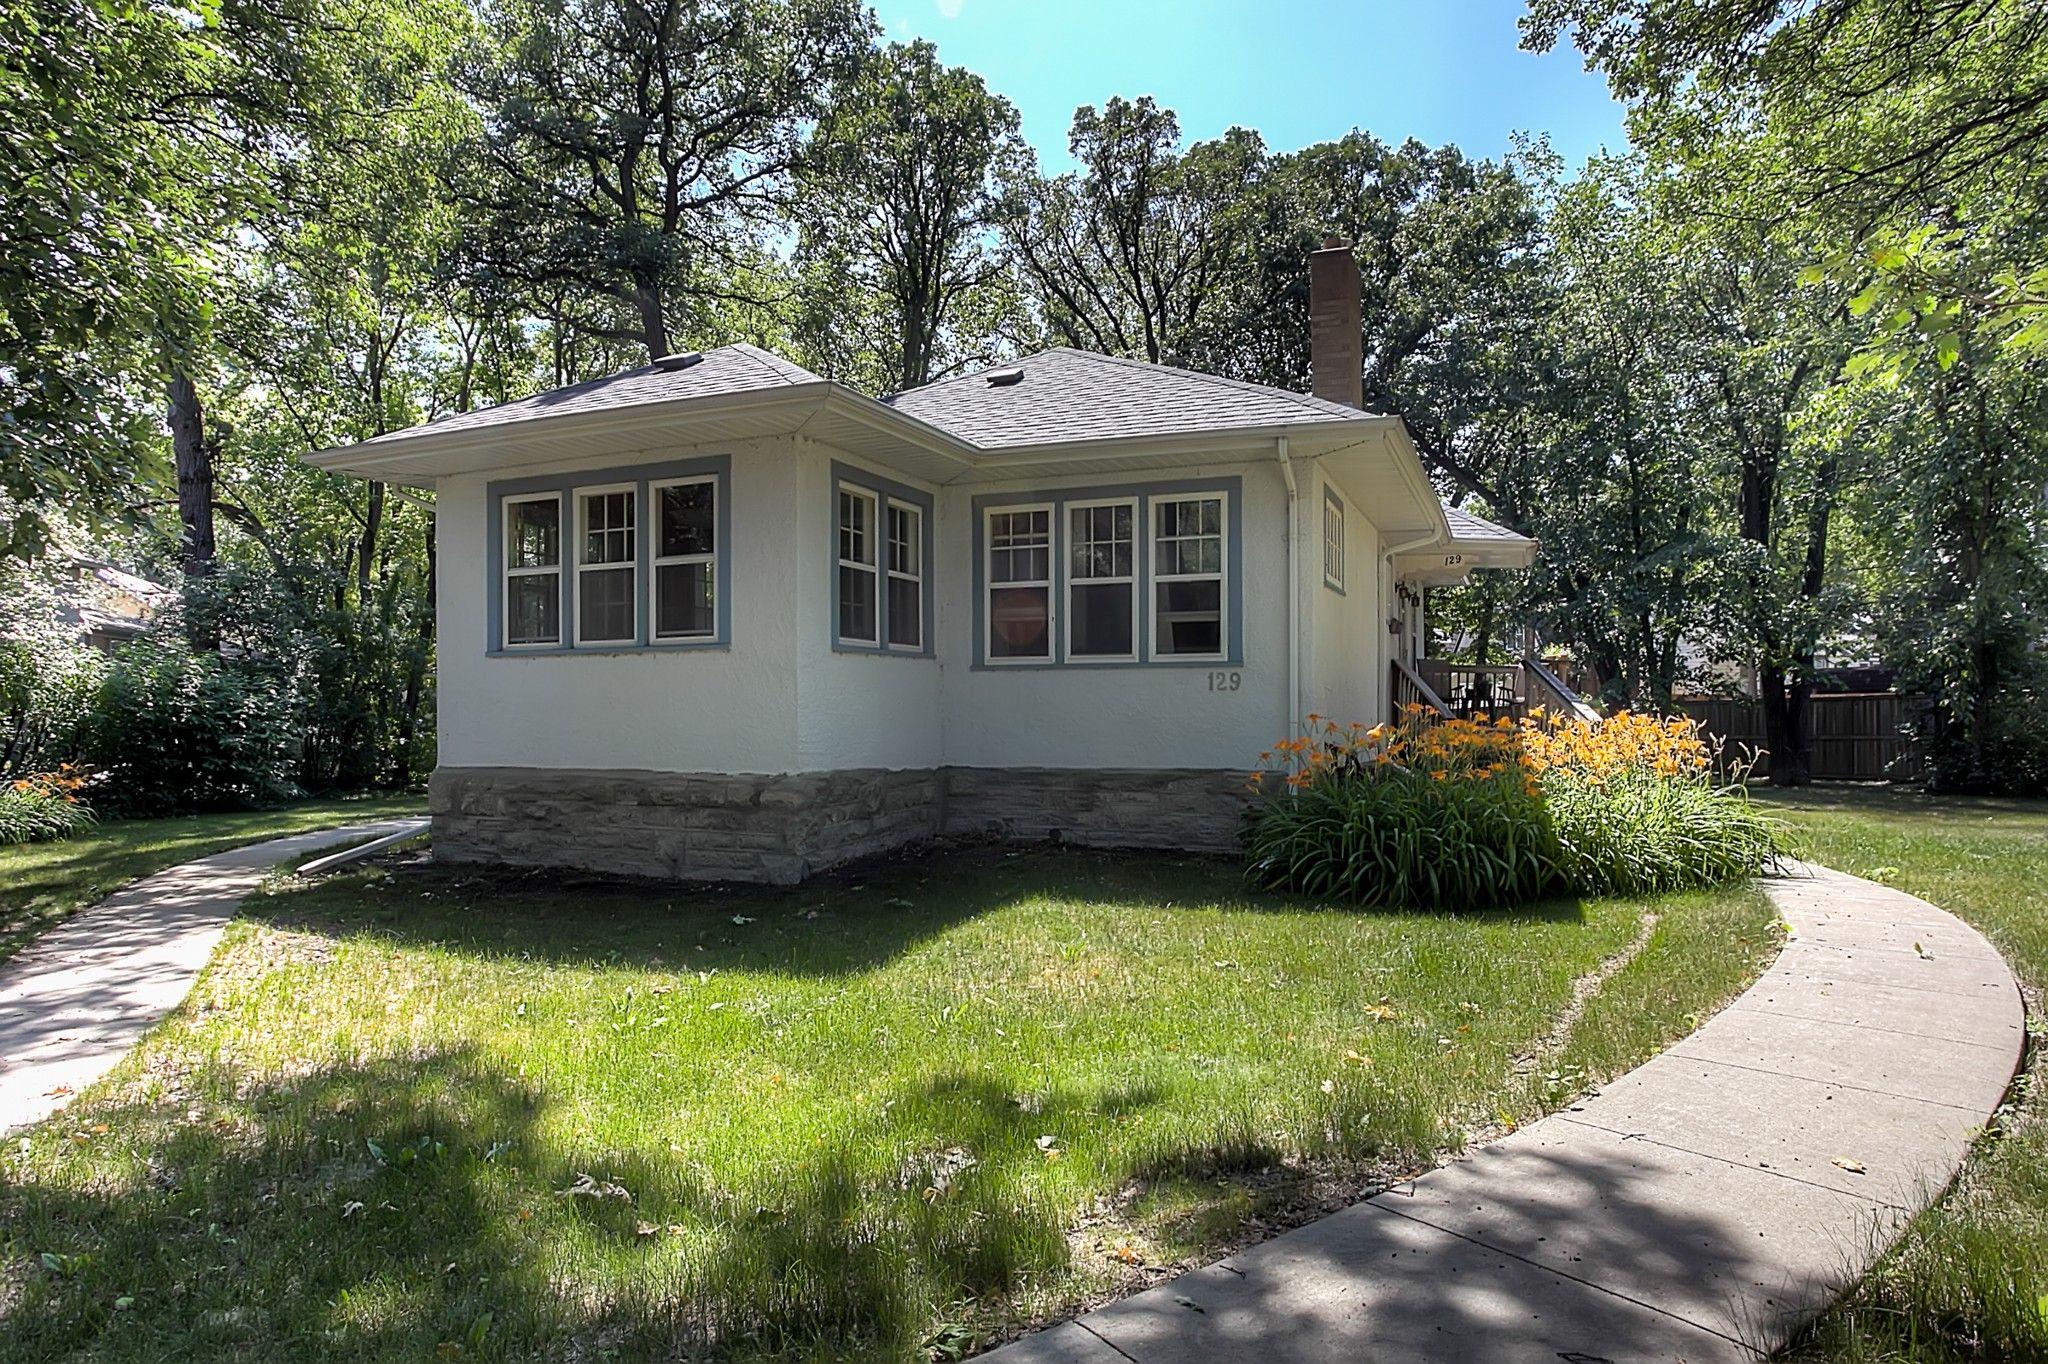 Main Photo: 129 Lanark Street in Winnipeg: River Heights North Single Family Detached for sale (1C)  : MLS®# 1922183